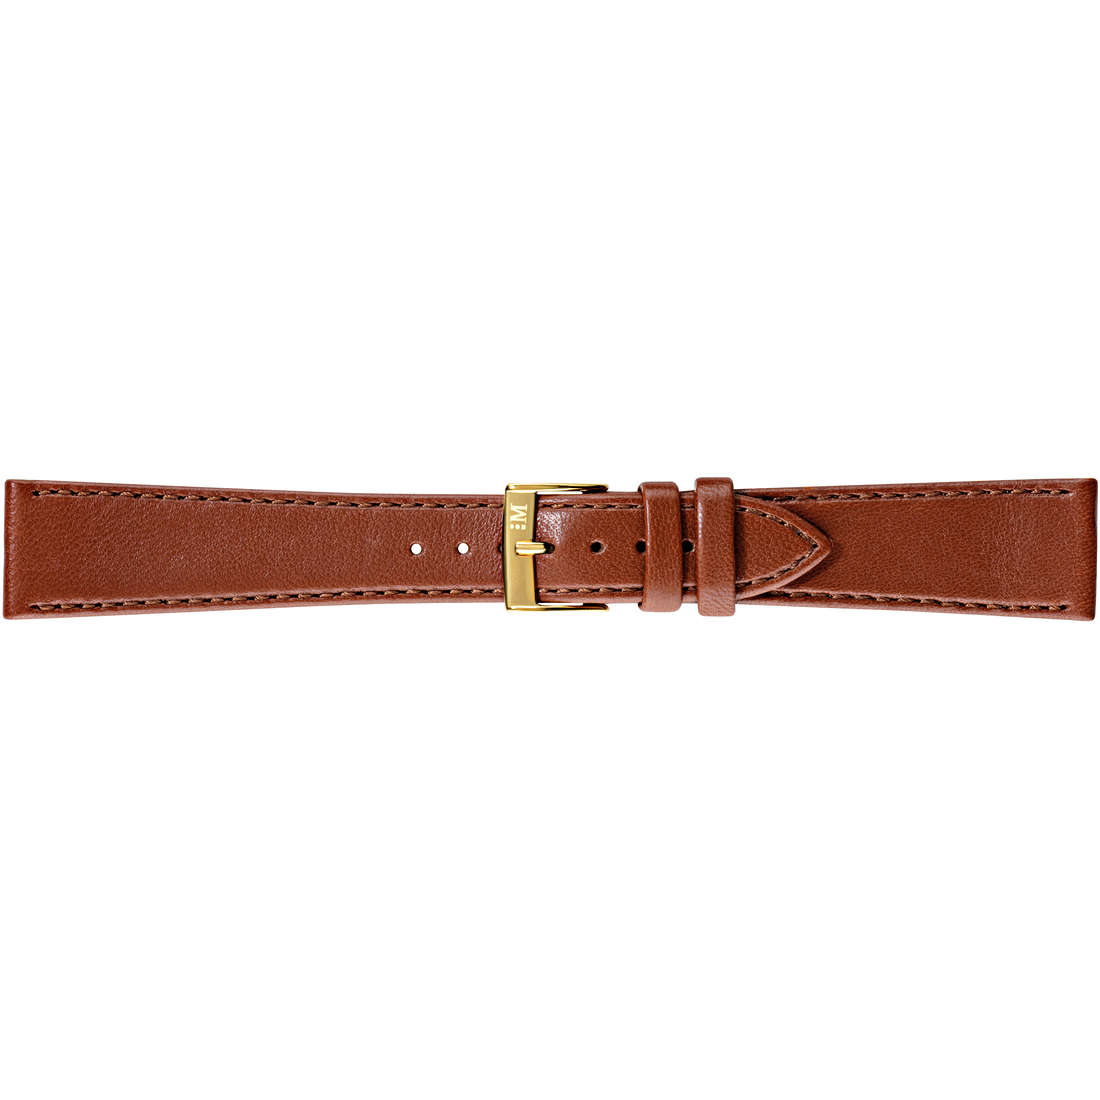 watch watch bands watch straps man Morellato Morellato 1930 A01U0770006041DO18